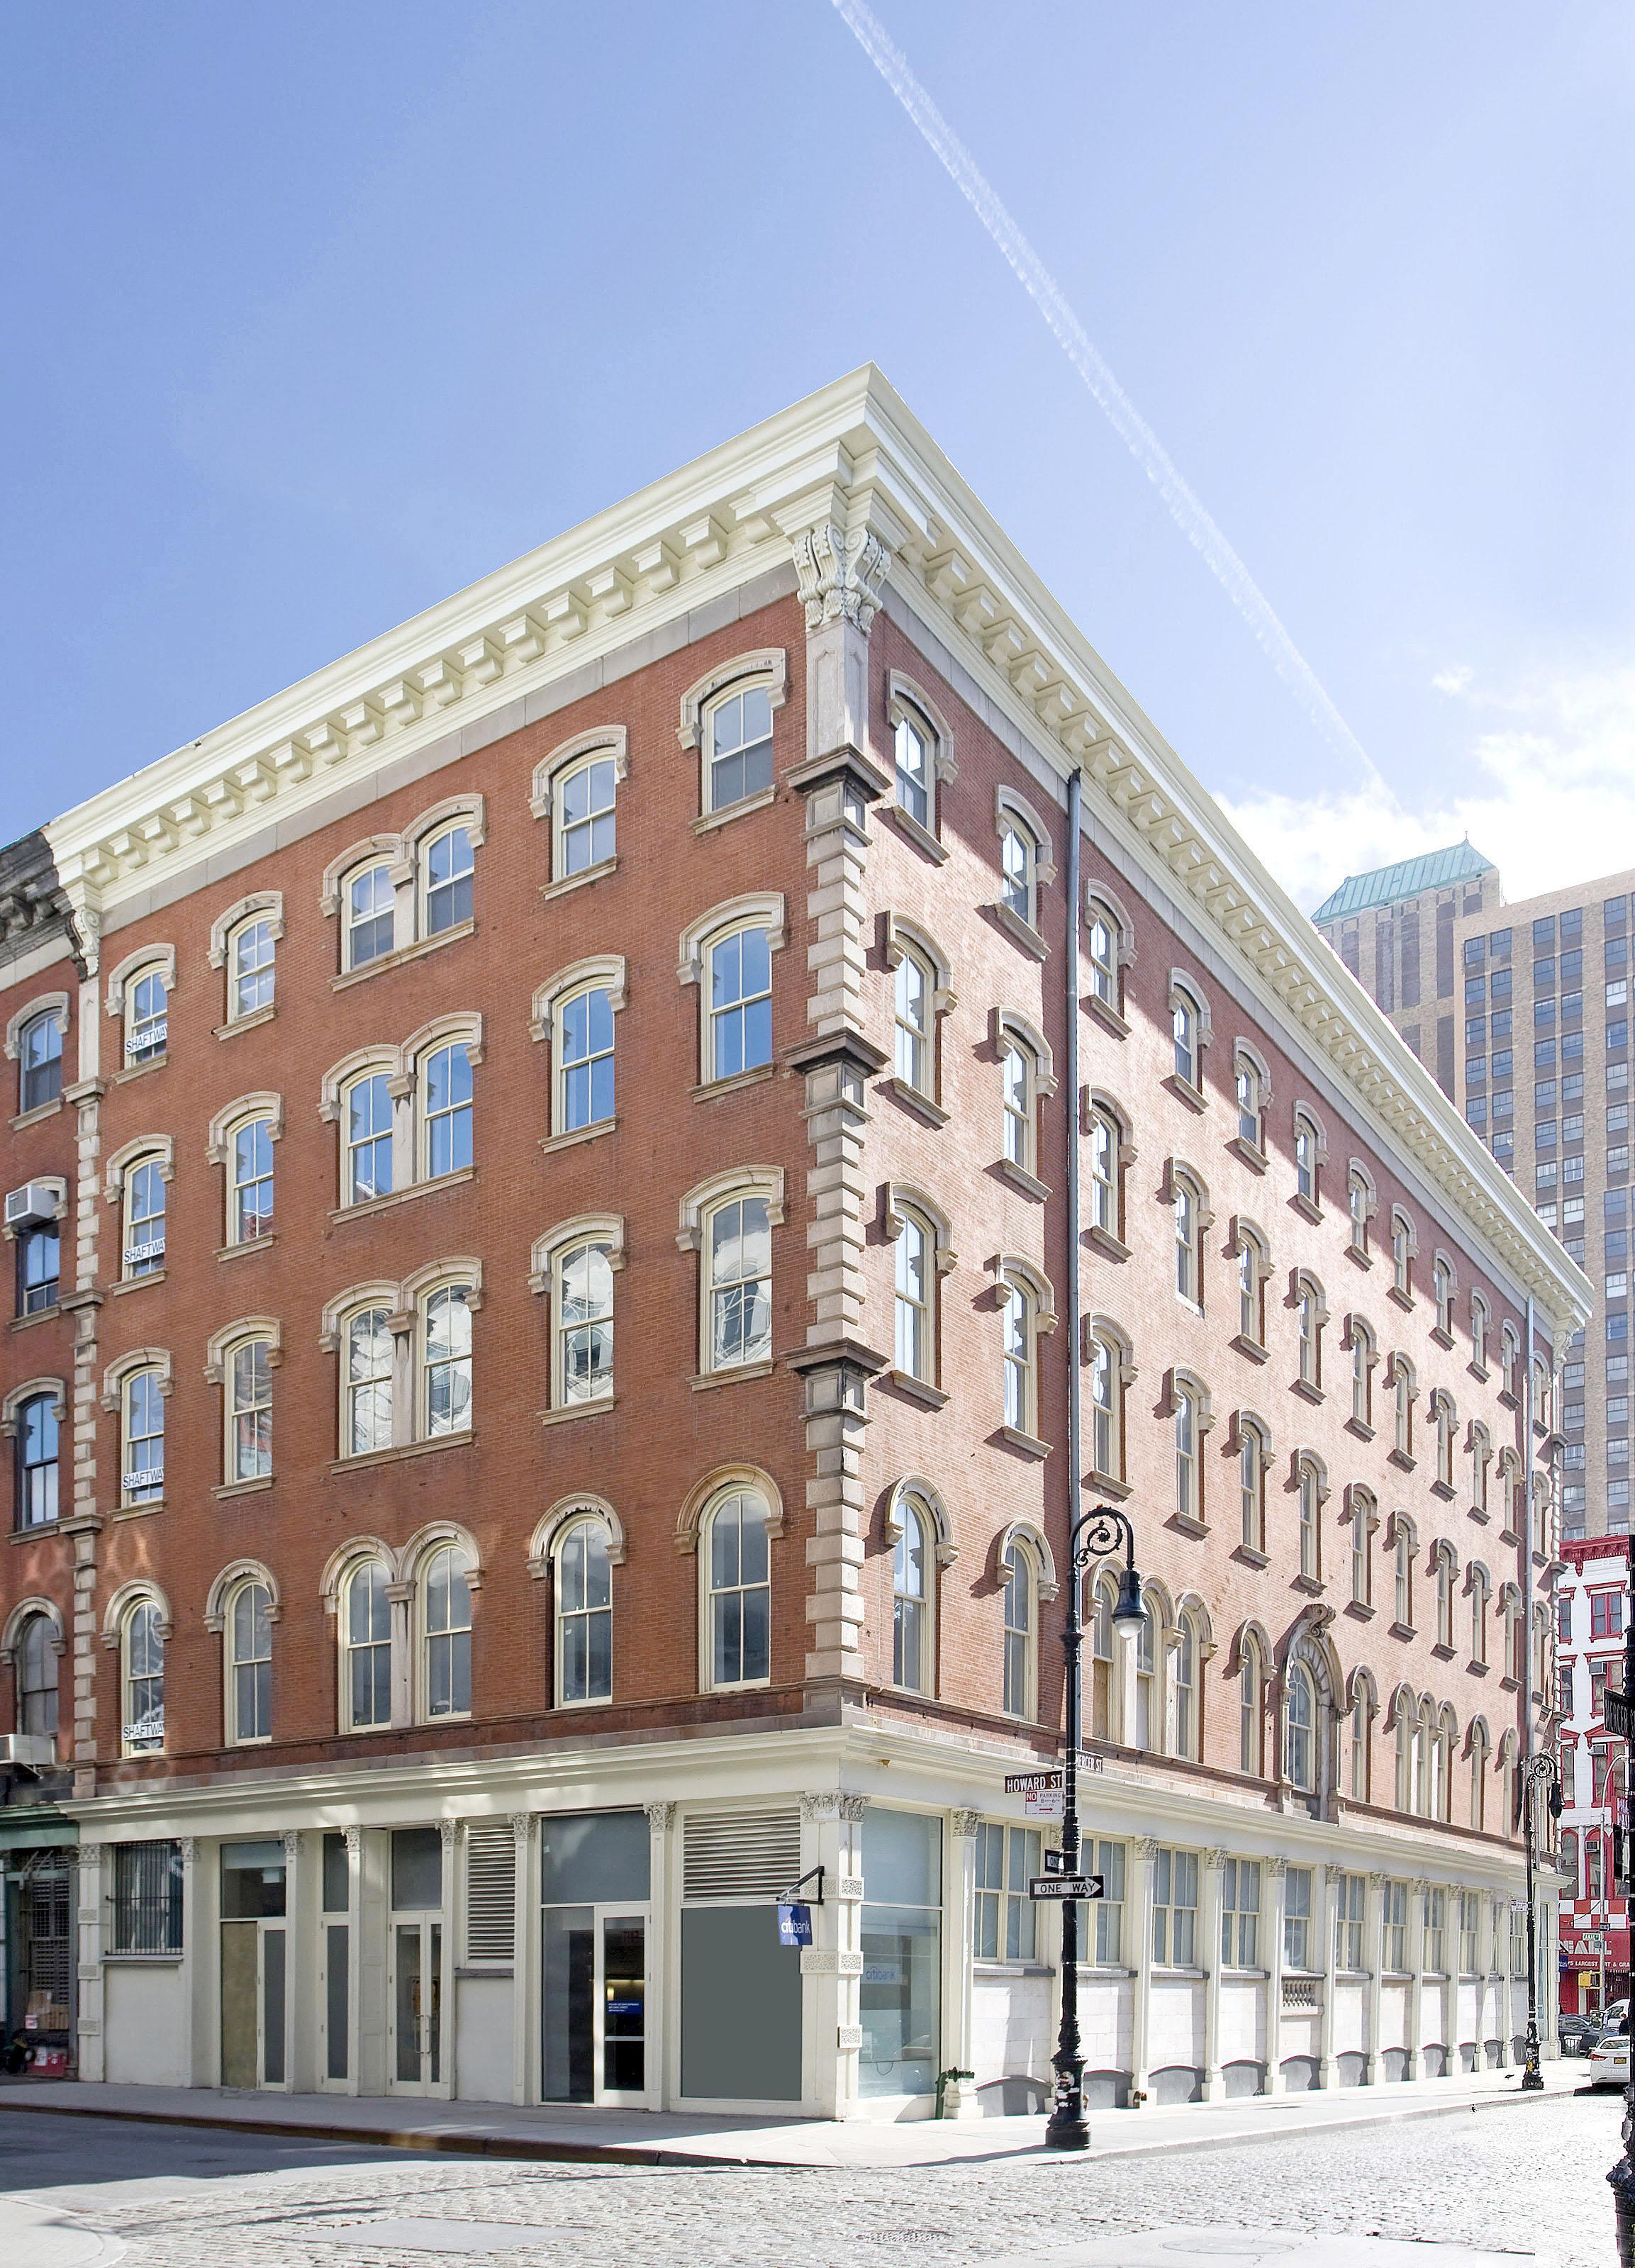 309 Canal Street